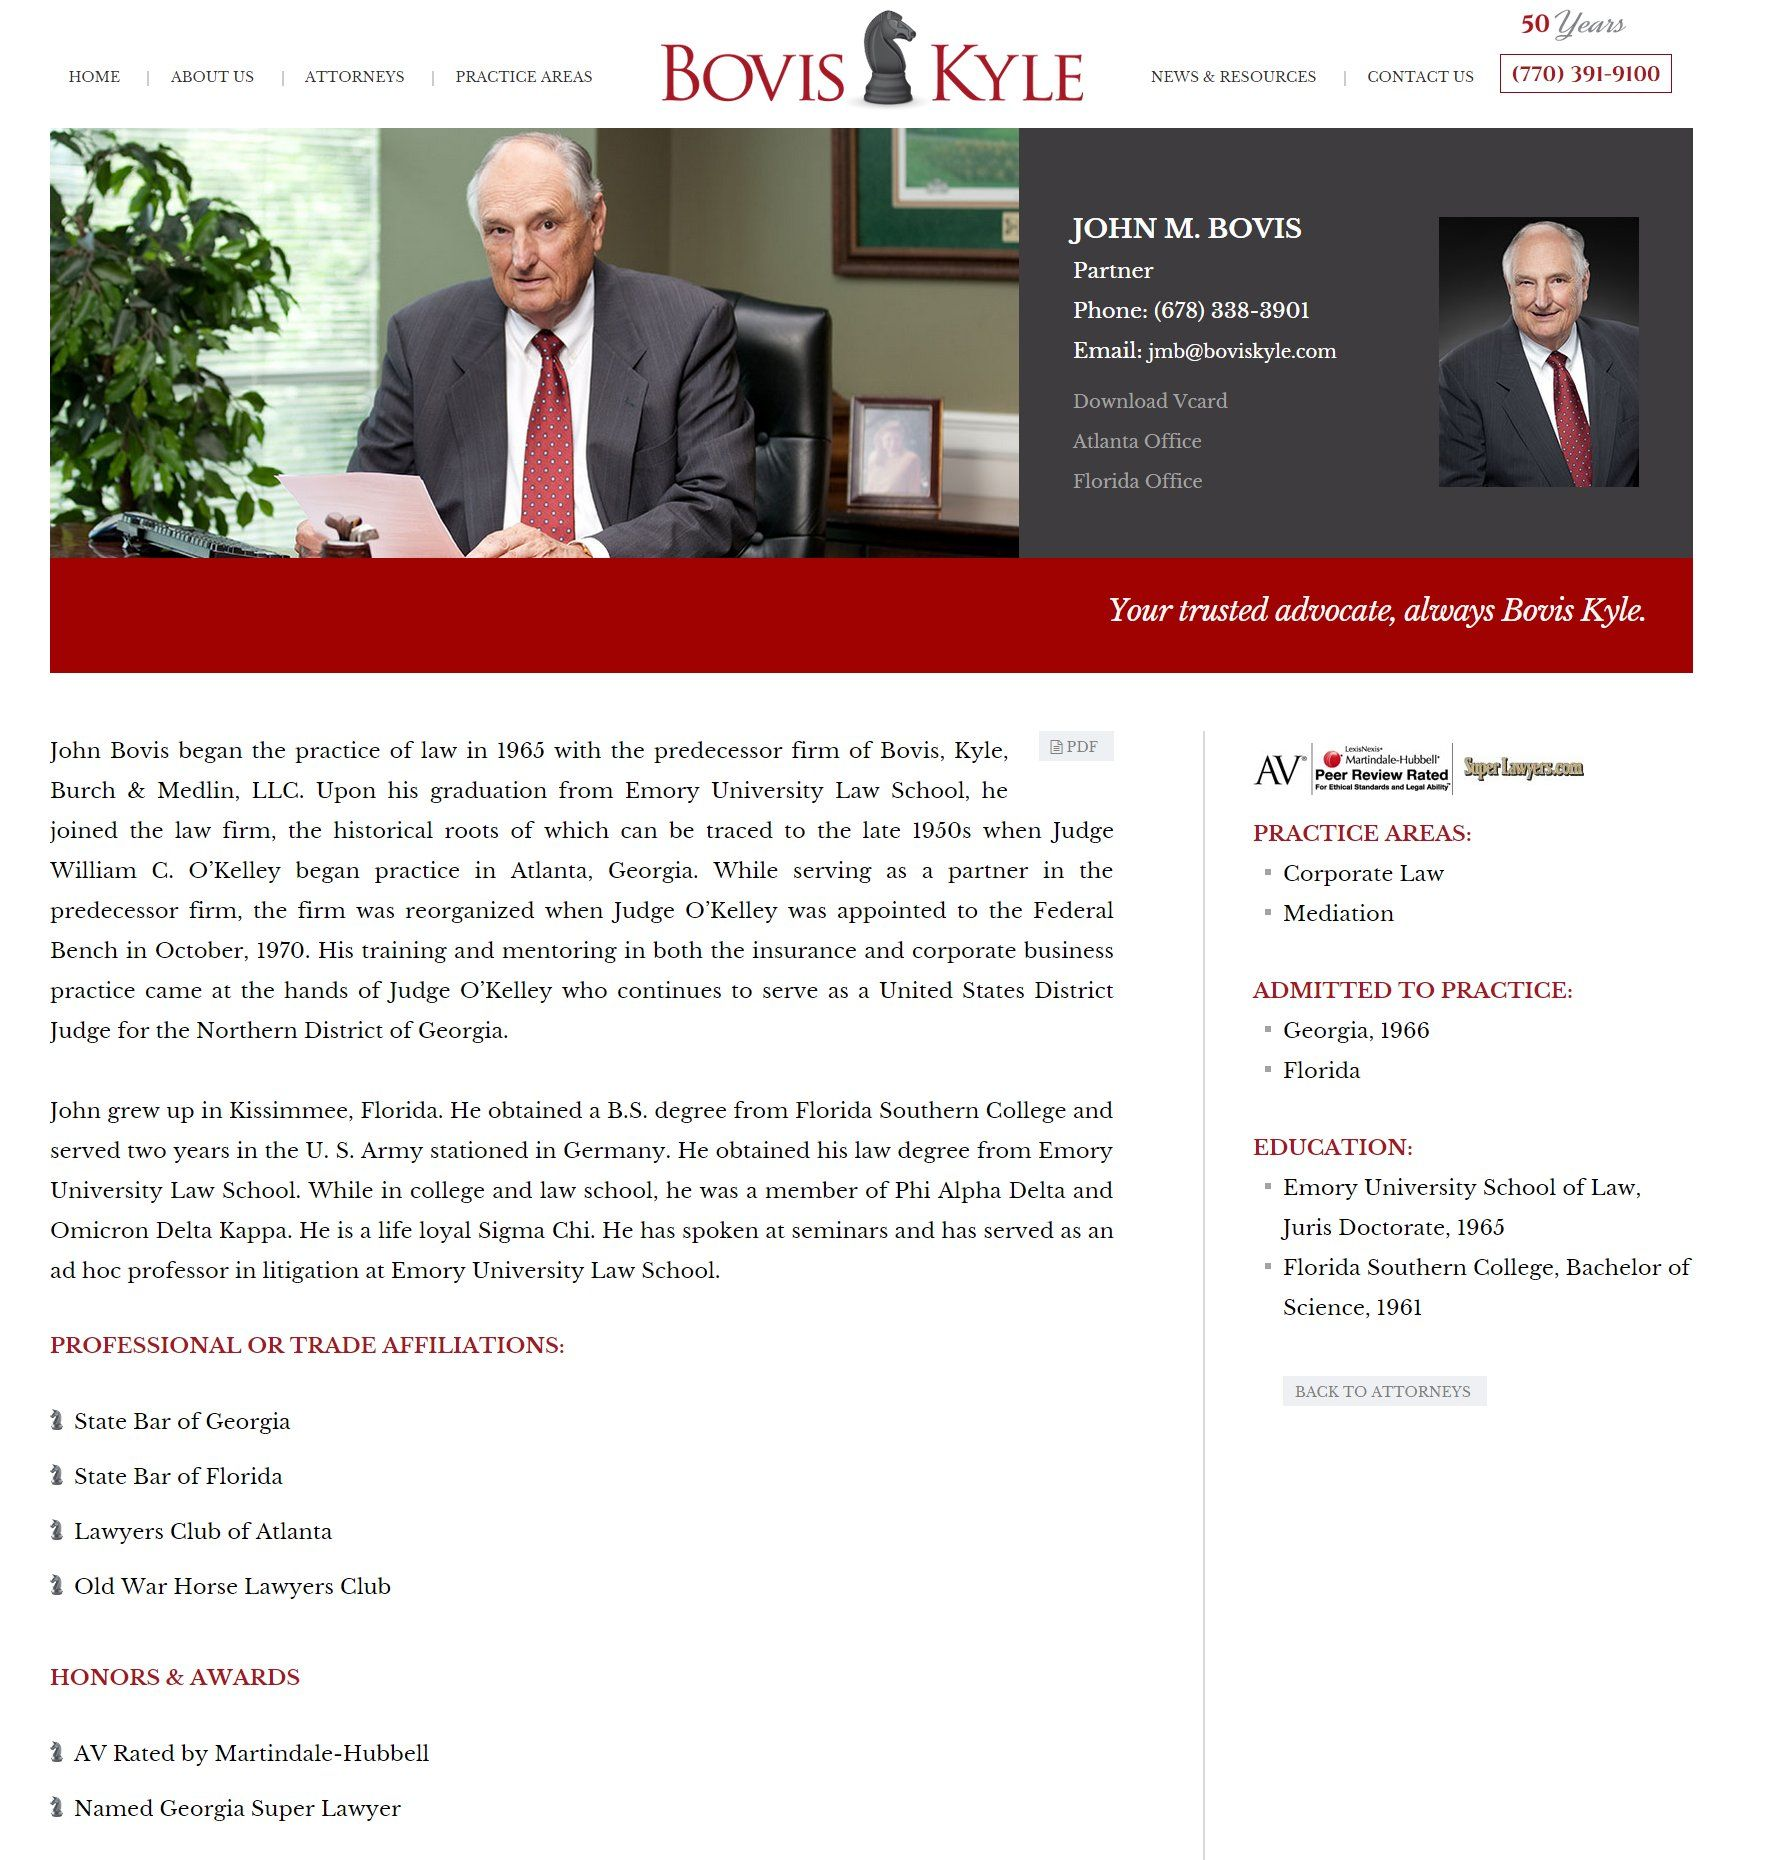 John M Bovis Web Design Web Design Inspiration Attorneys